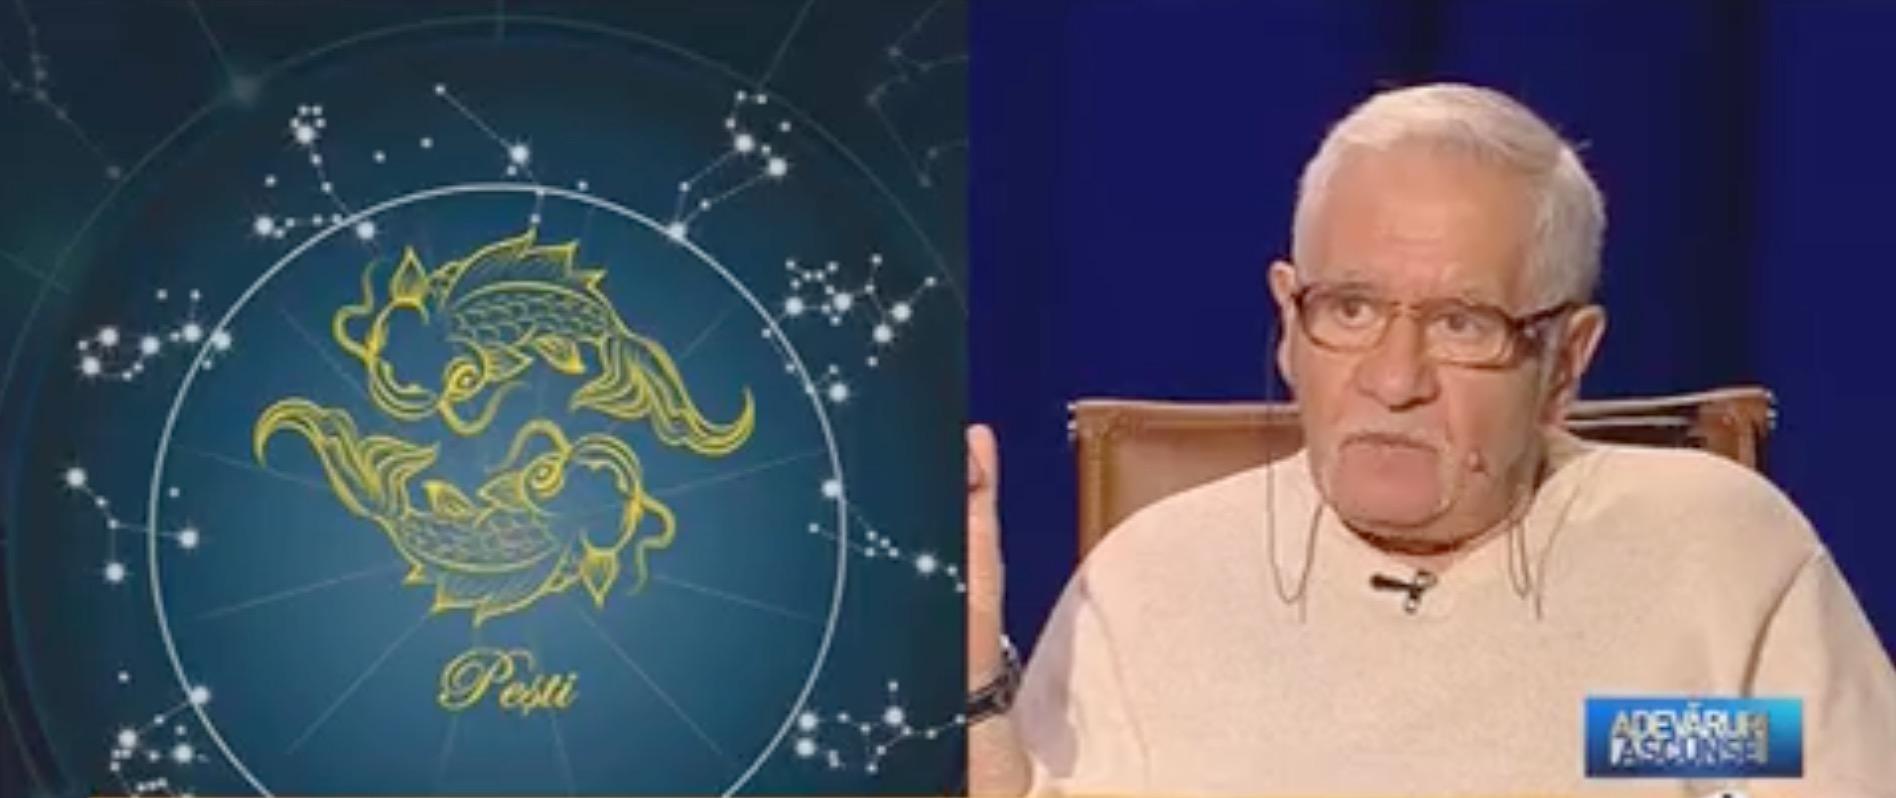 Mihai Voropchievici Rune 10-16 februarie - Horoscopul săptămânal